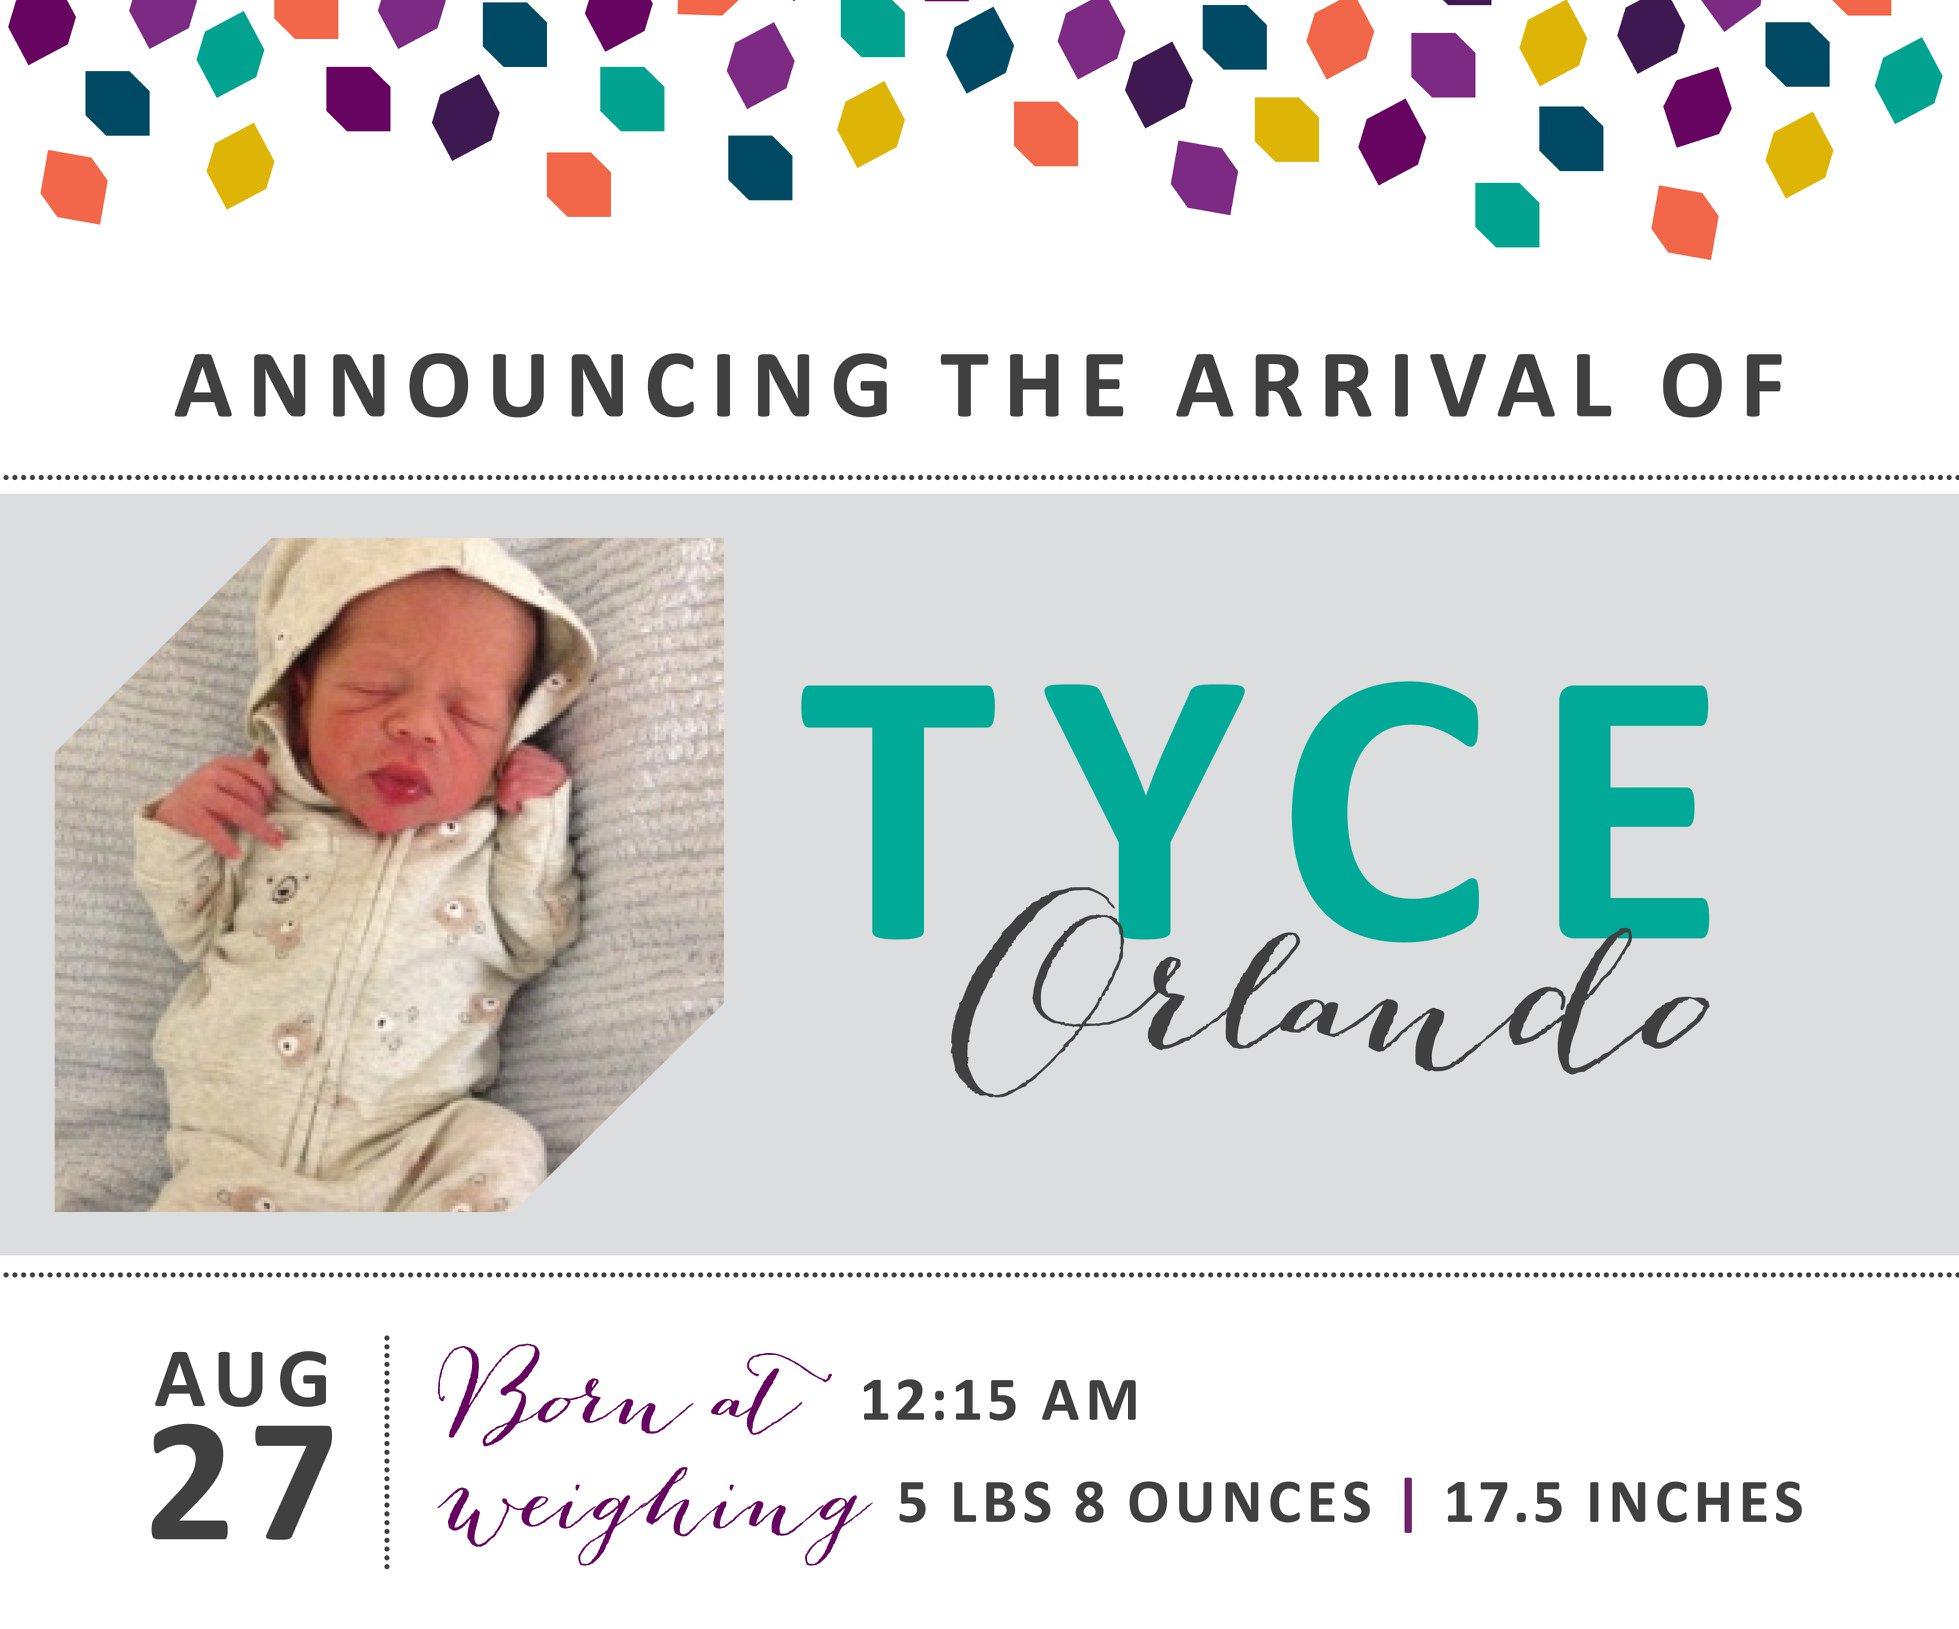 Tyce Orlando 1